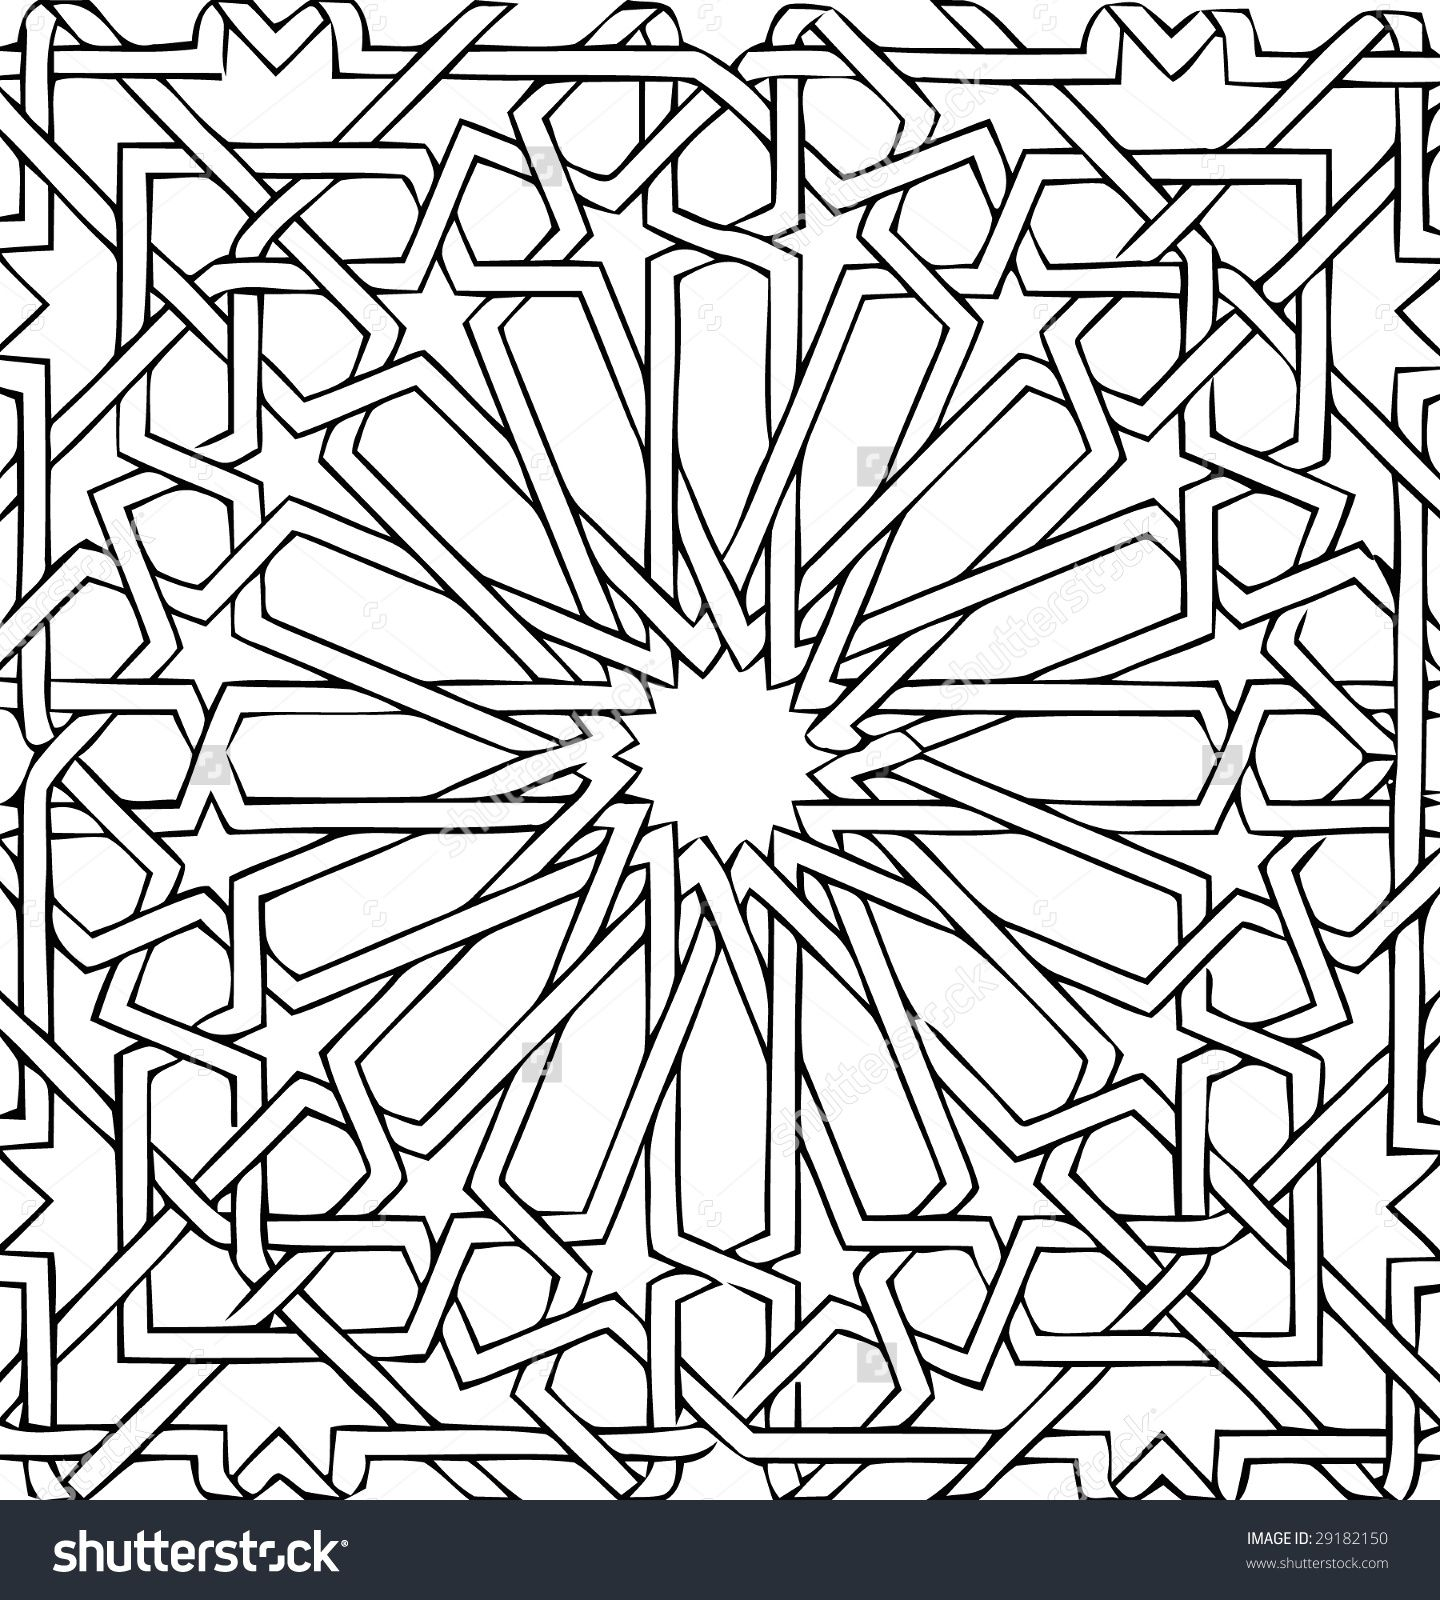 Beautiful 16X32 Ceiling Tiles Big 18 Inch Floor Tile Round 18 X 18 Ceramic Tile 20 X 20 Floor Tile Patterns Youthful 24 X 24 Ceiling Tiles Fresh3 X 12 Subway Tile Vector   Arabic Ceramic Tile | Osmanlı Selçuklu Motifleri ..